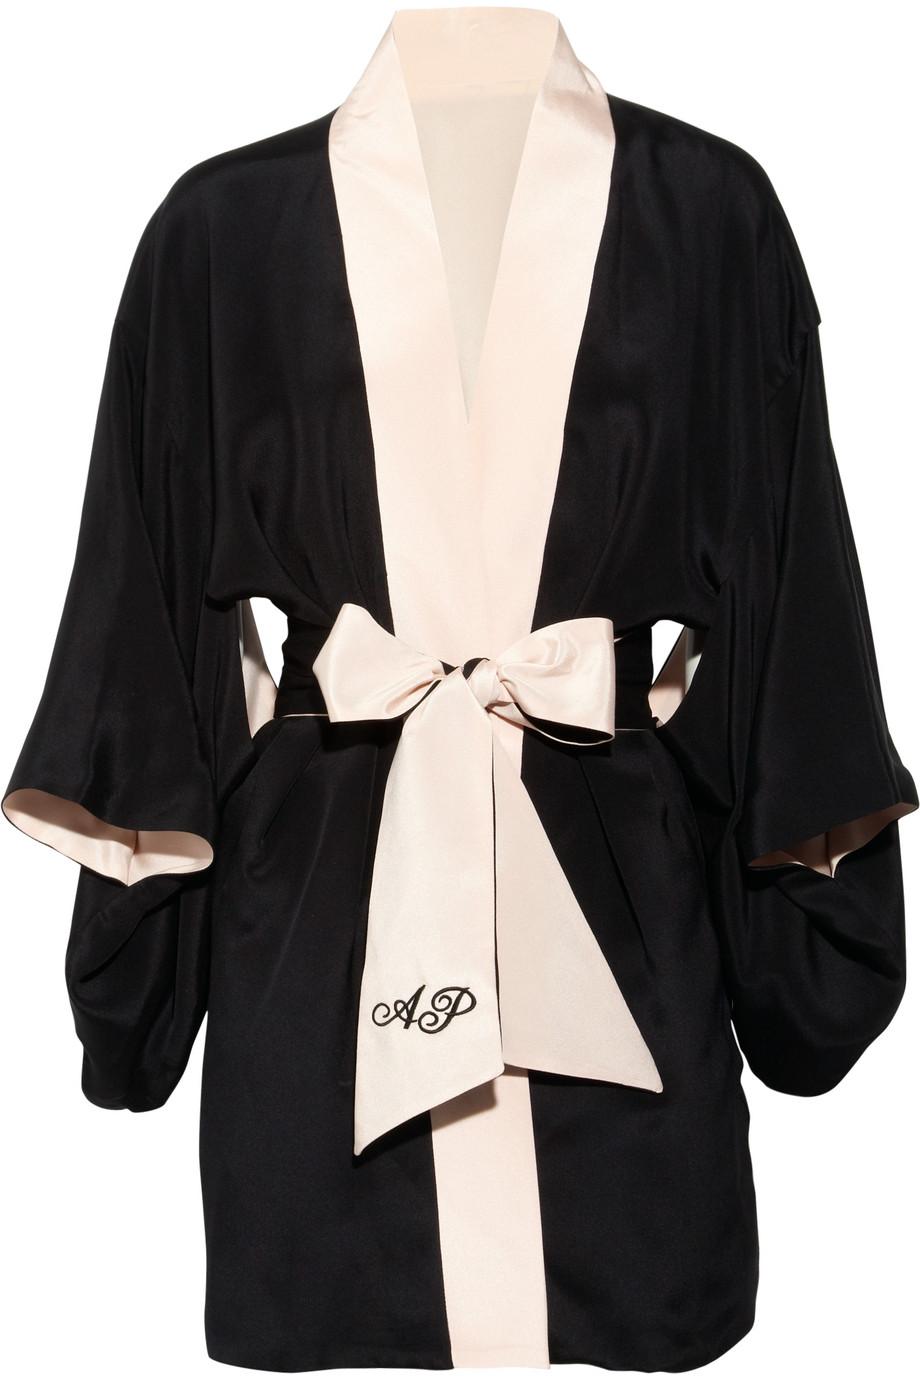 Agent Provocateur kimono